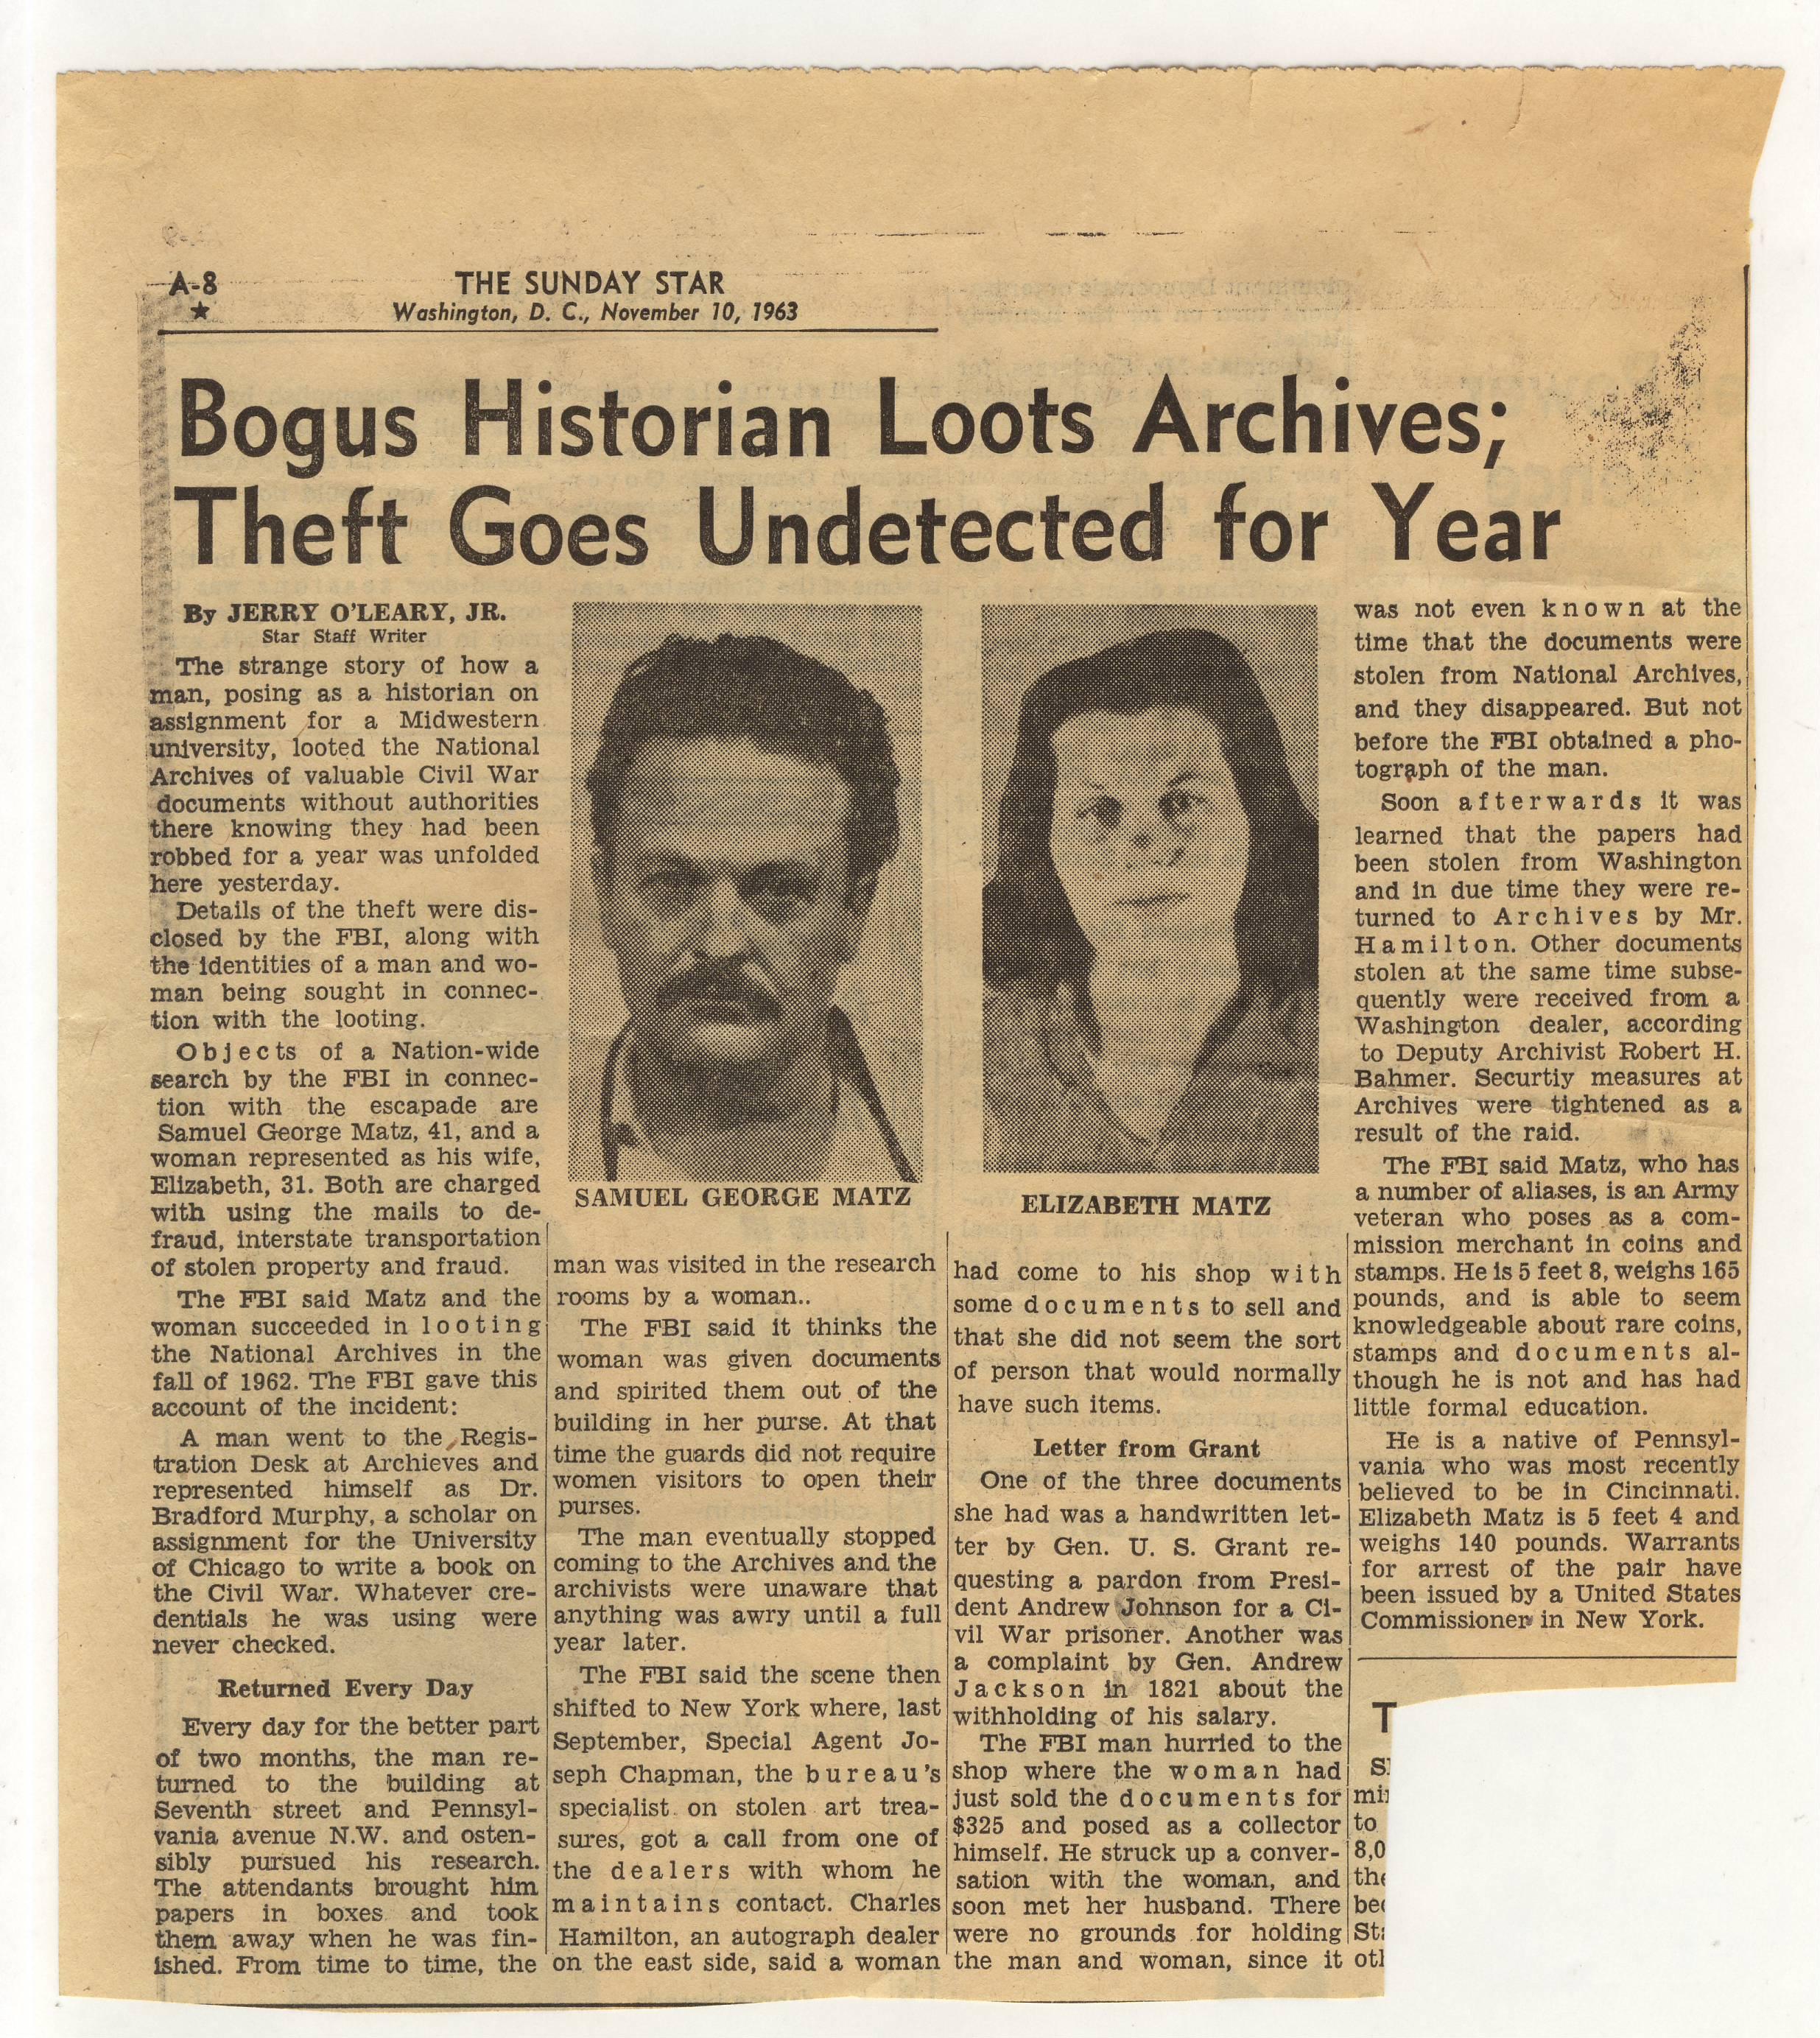 RG 64, P 67, file 1962 - Matz Theft Case from NA, Nov.